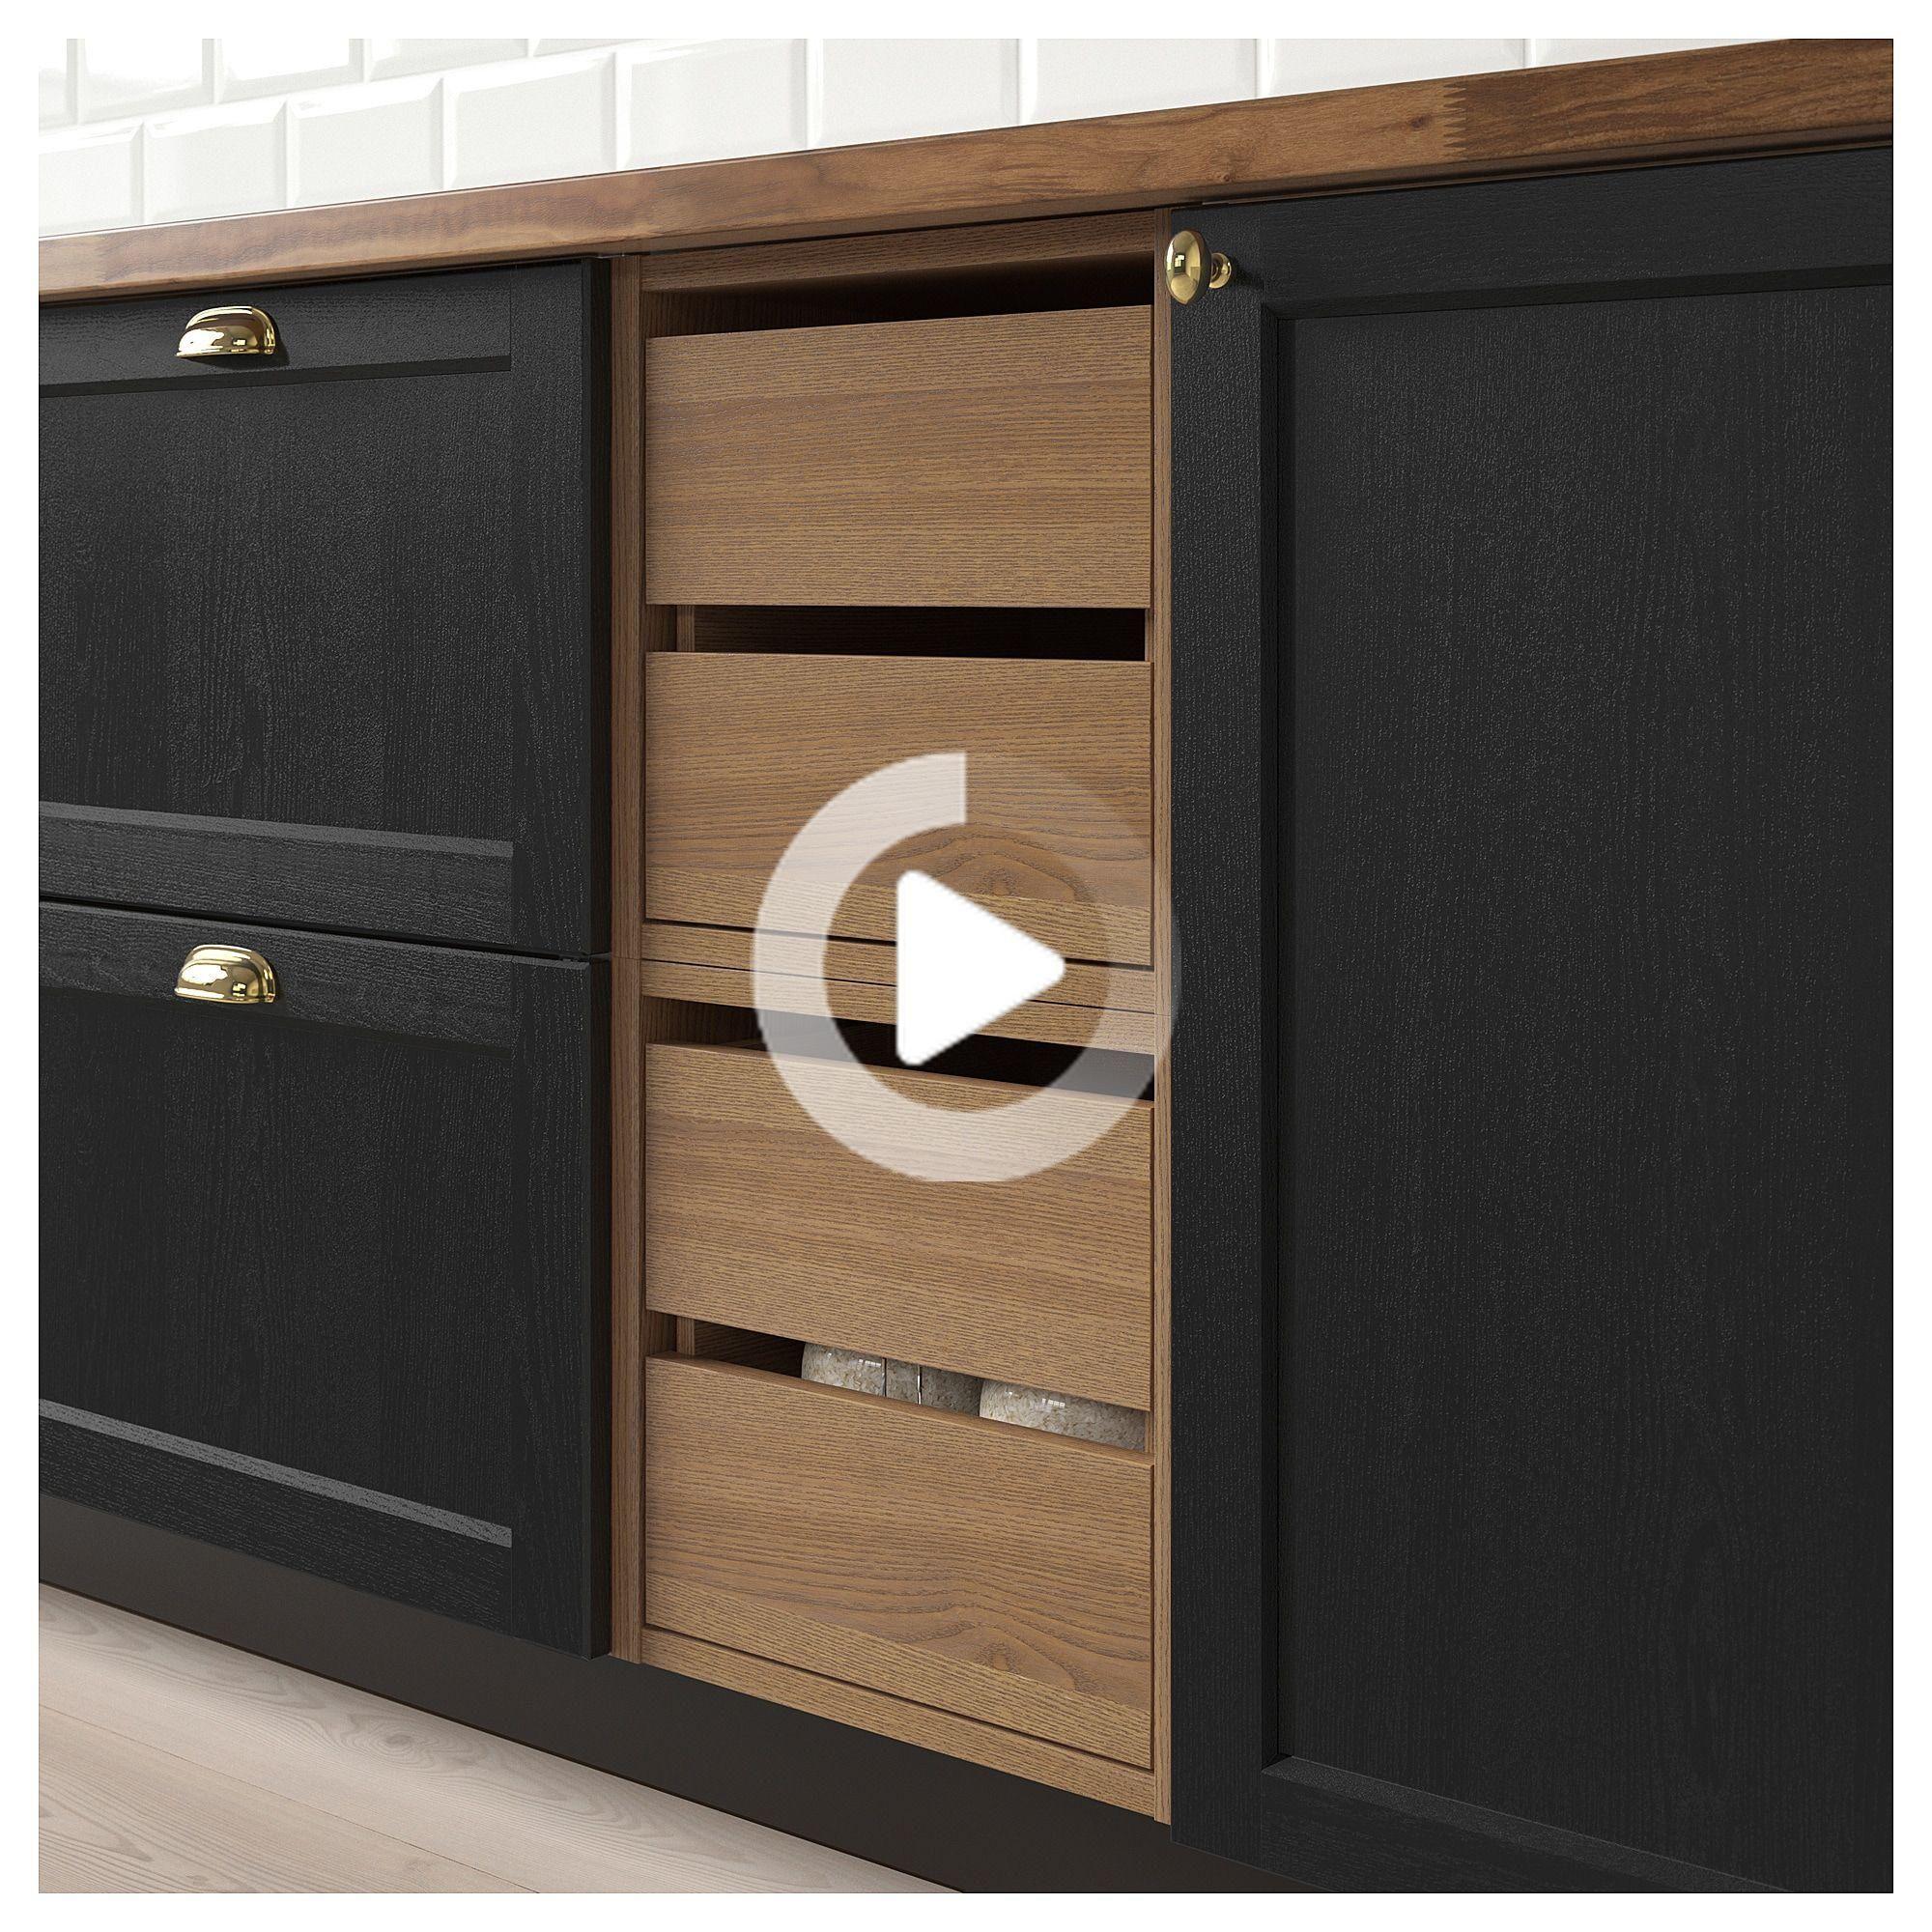 Ikea Vadholma Bloc Tiroirs Brun Frene Teinte En 2020 Meuble Rangement Ikea Decoration Chambre Traditionnelle Meuble Rangement